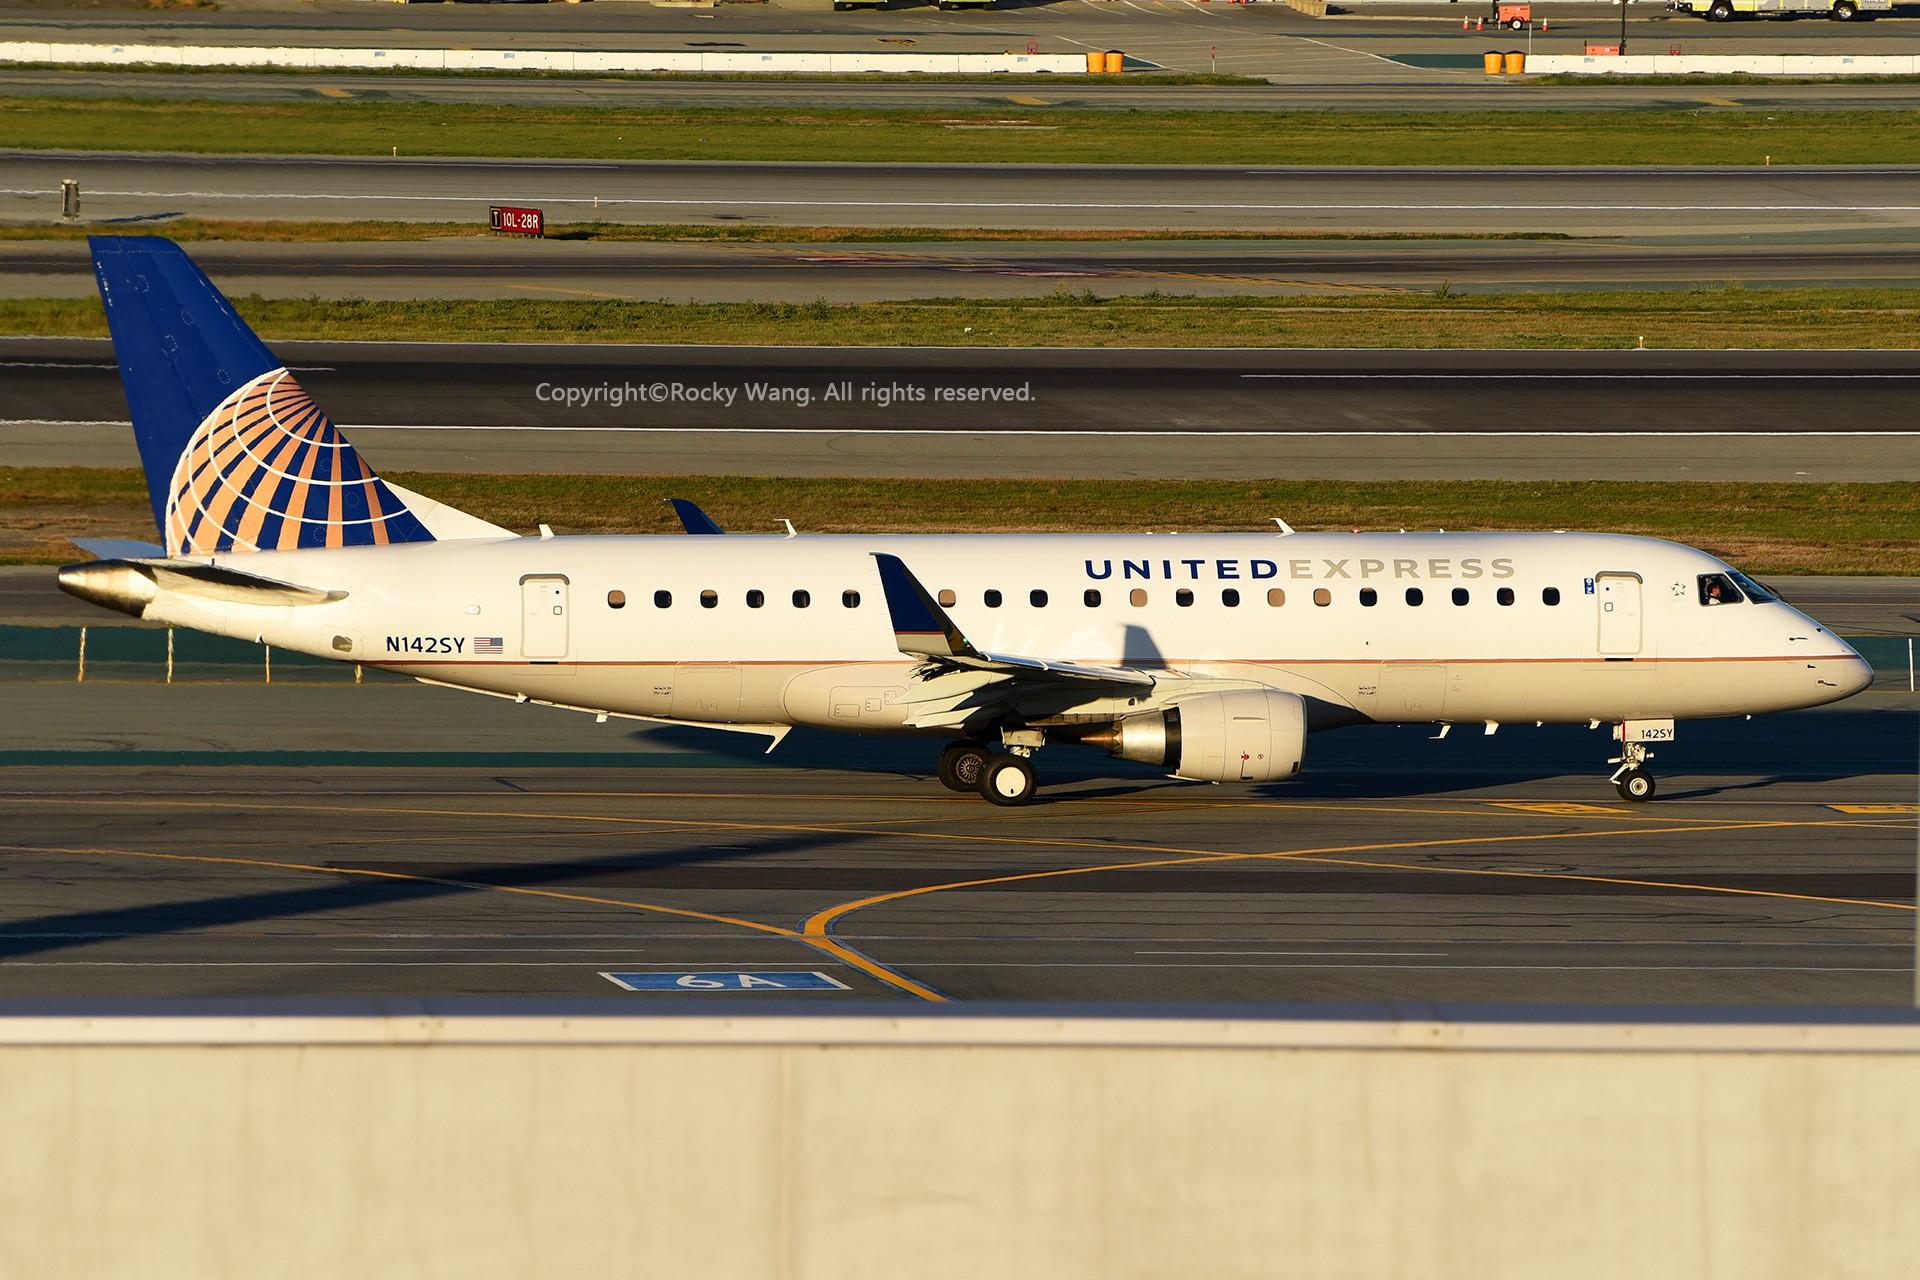 Re:[原创]窄体连连看 EMBRAER 170-200LR N142SY 美国旧金山机场